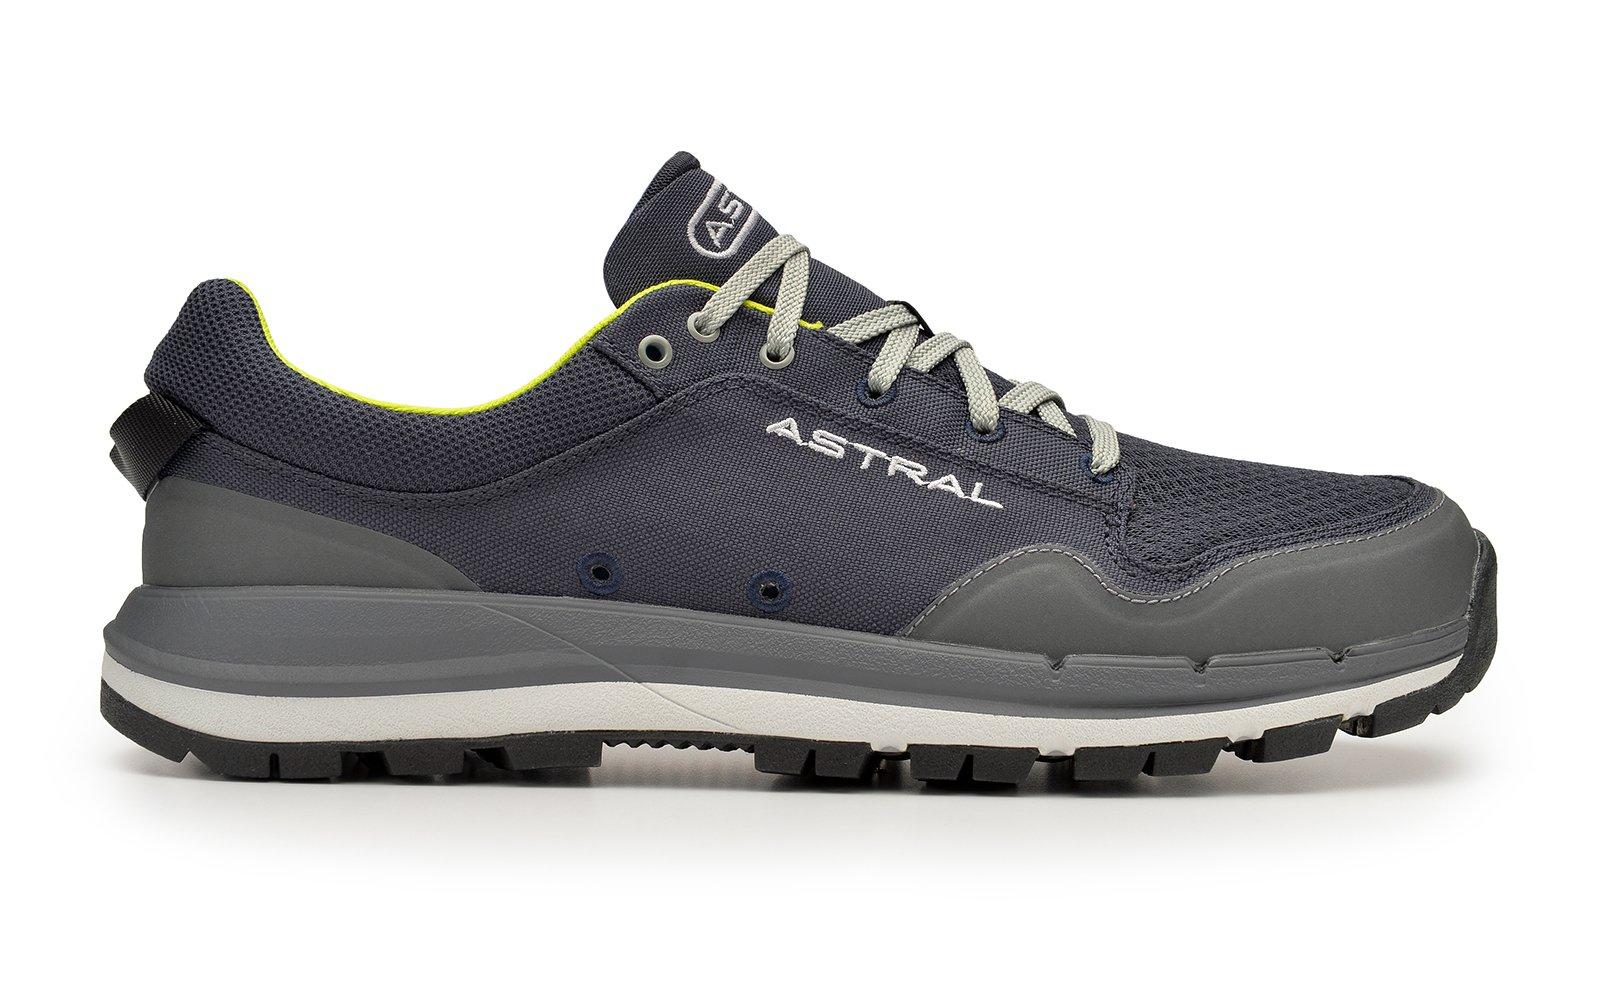 Astral TR1 Junction Men's Water Hiking Shoe - Deep/Water/Navy - 8.5